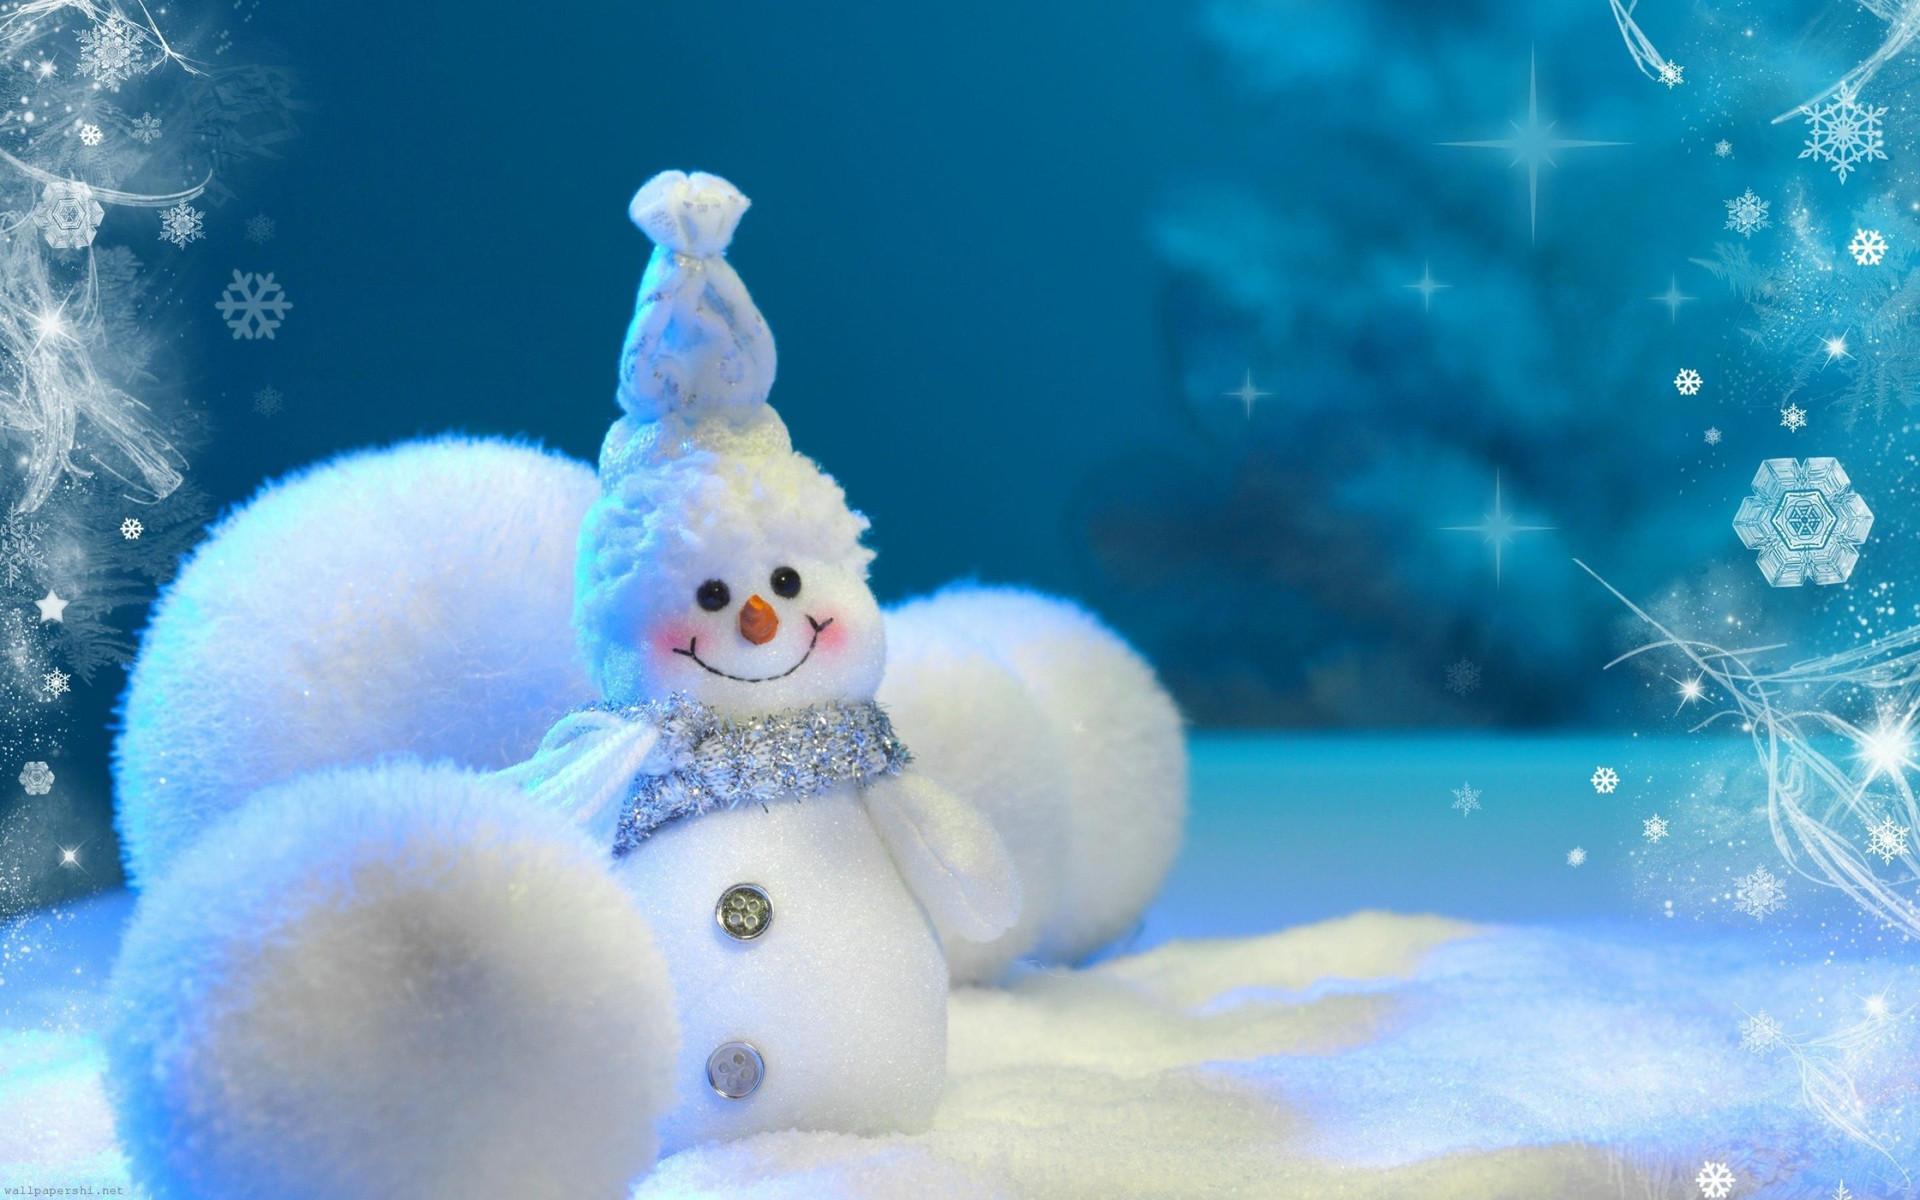 Disney Christmas Wallpapers Desktop 82 background pictures